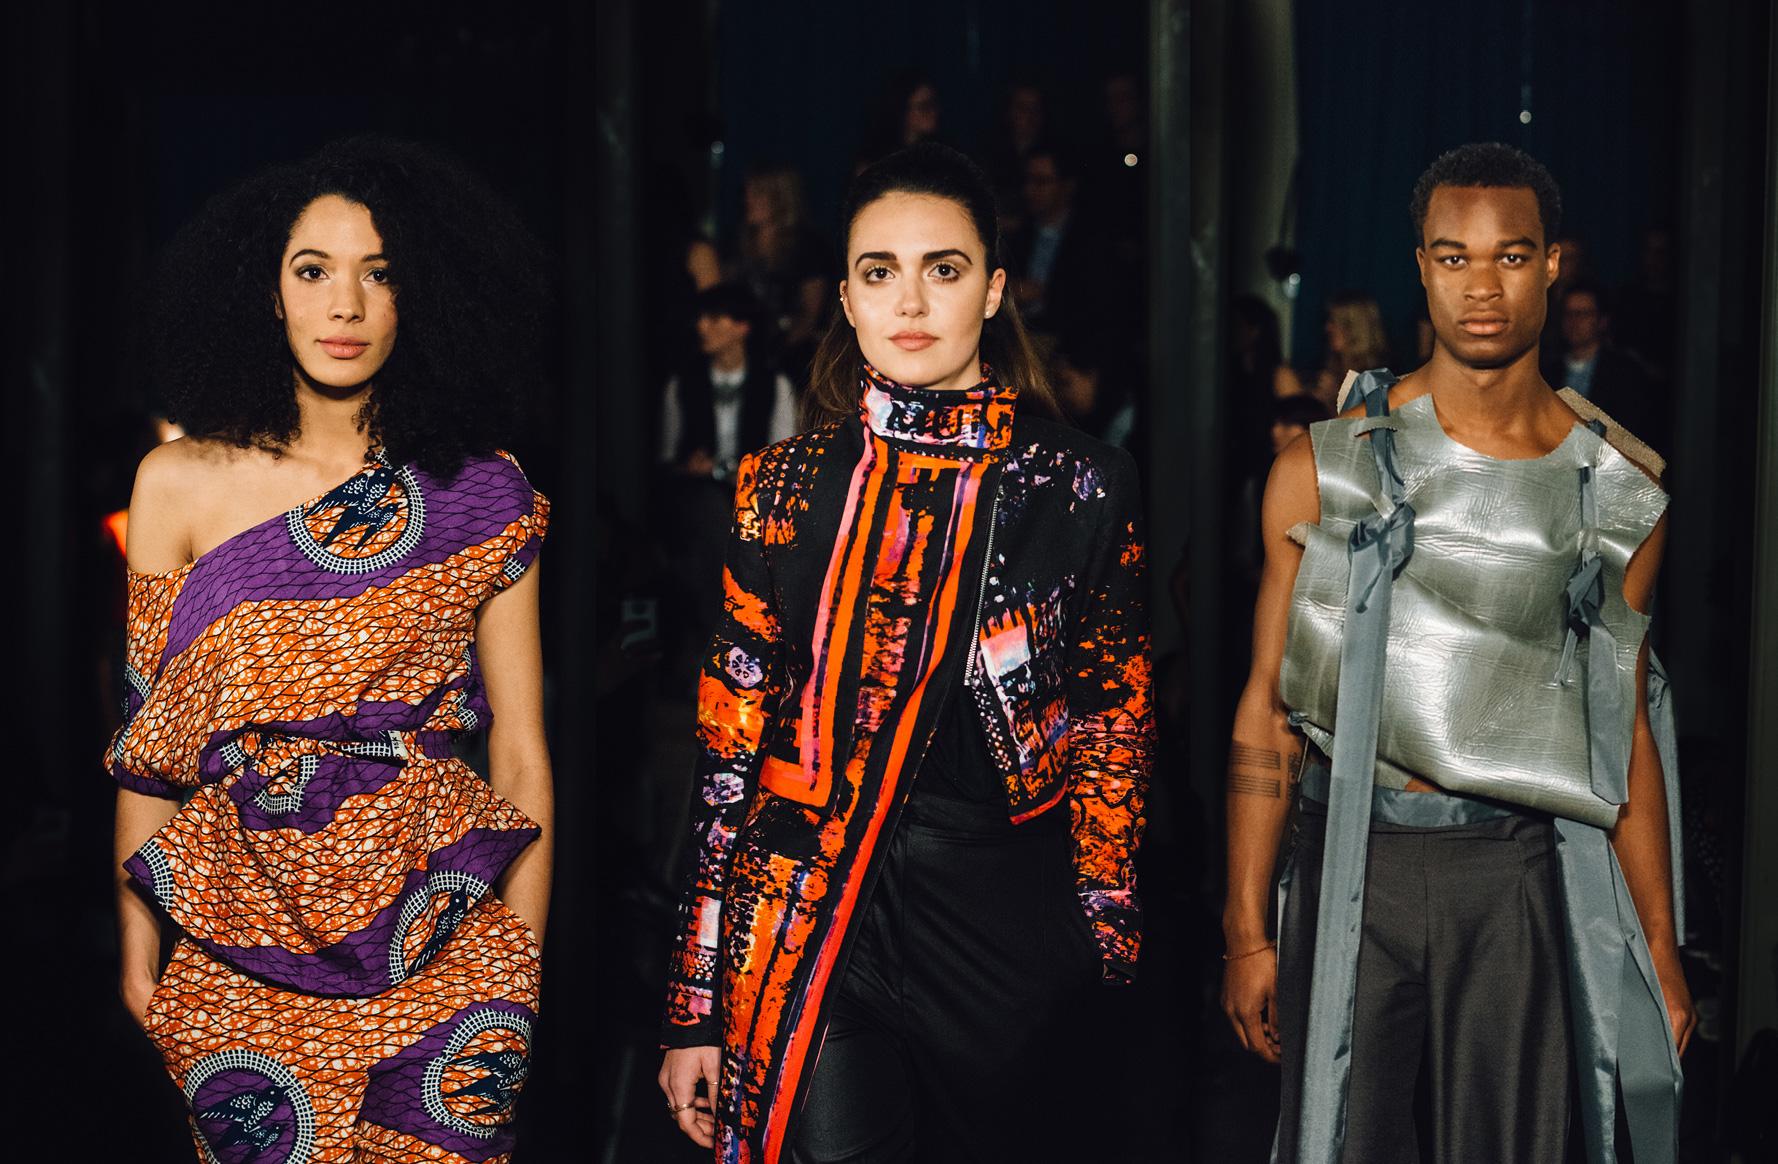 NFS Fashion Show, photos by José Chan